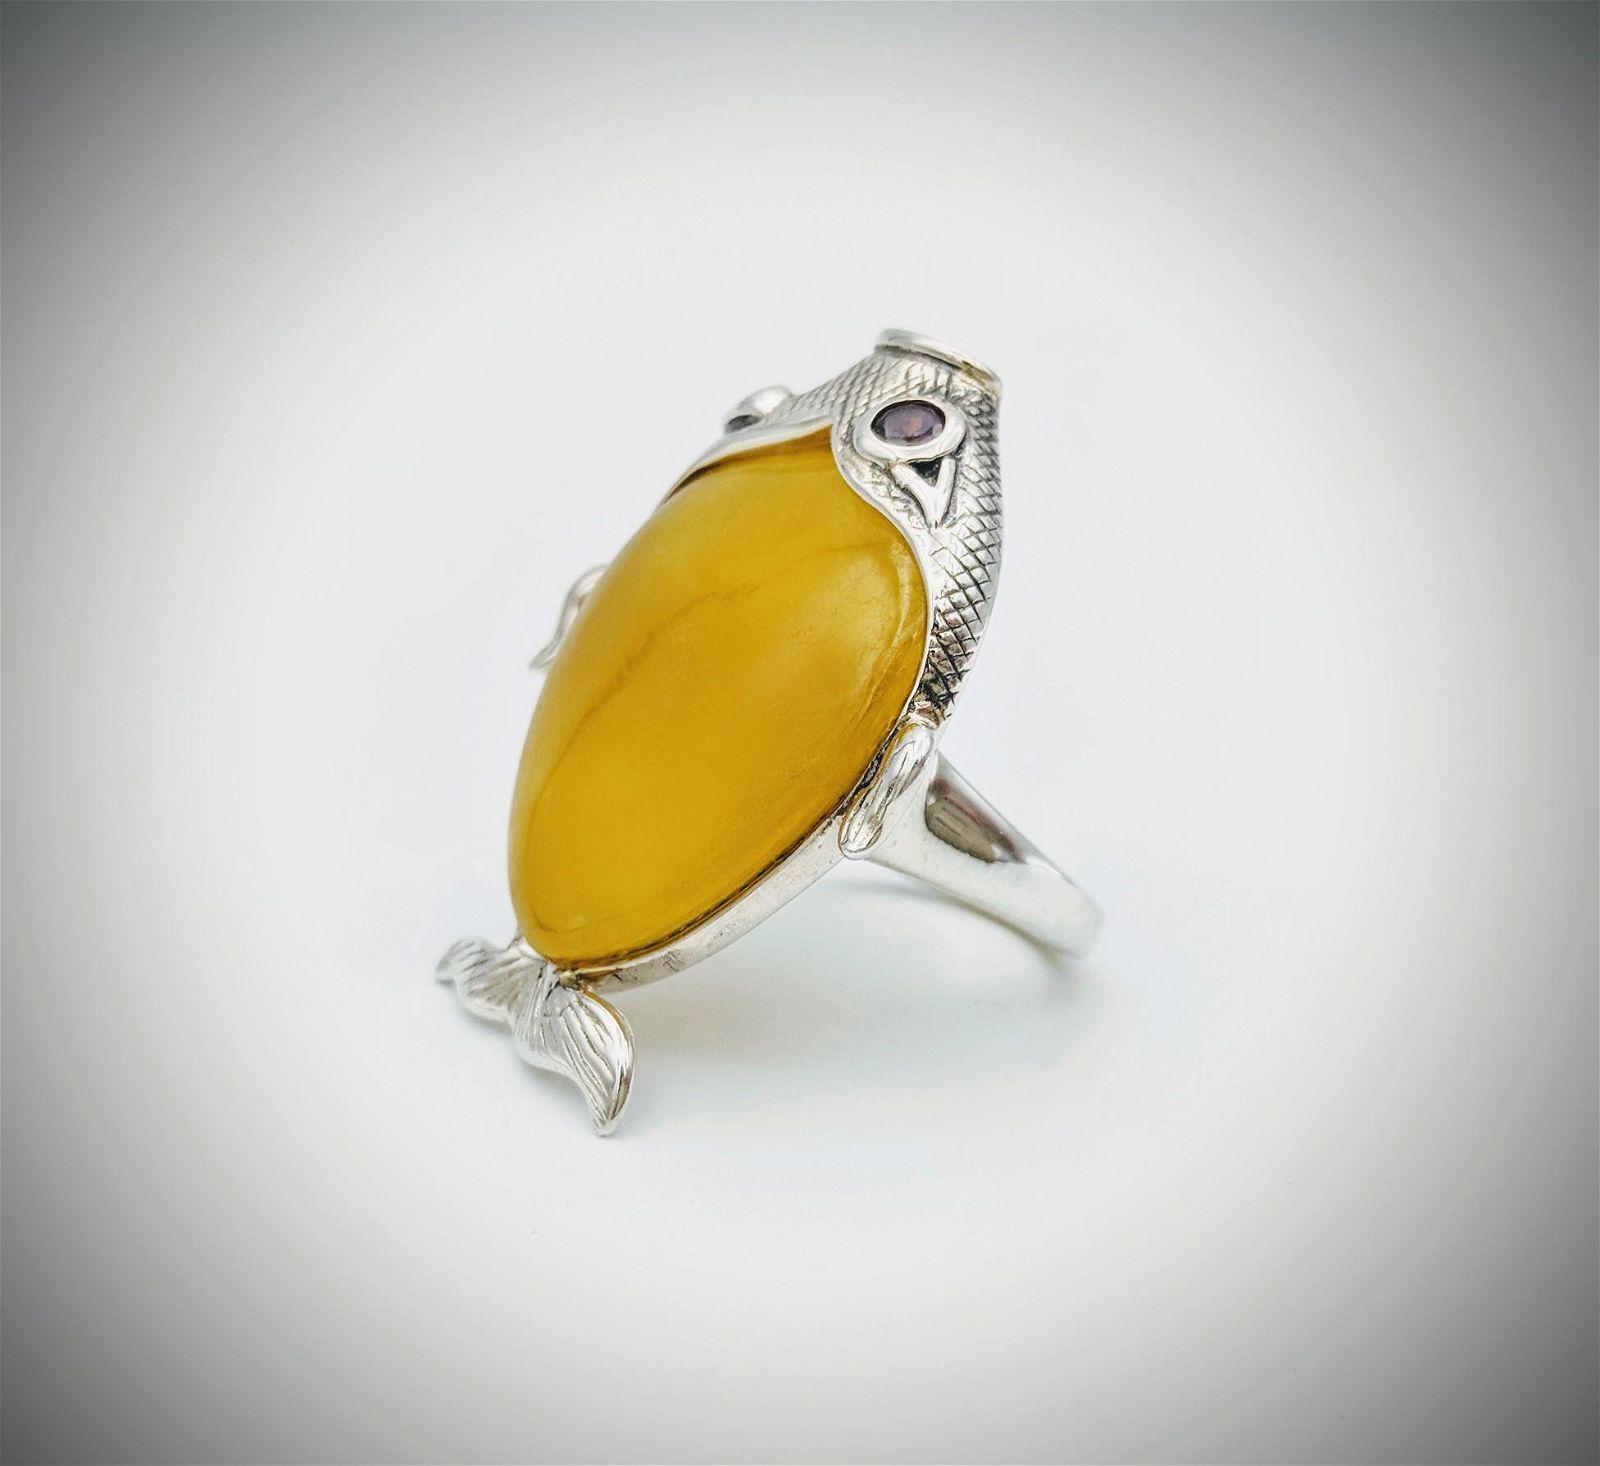 925 SS Fish Designed Sz 7 Ring w Yellow Jade Amethyst